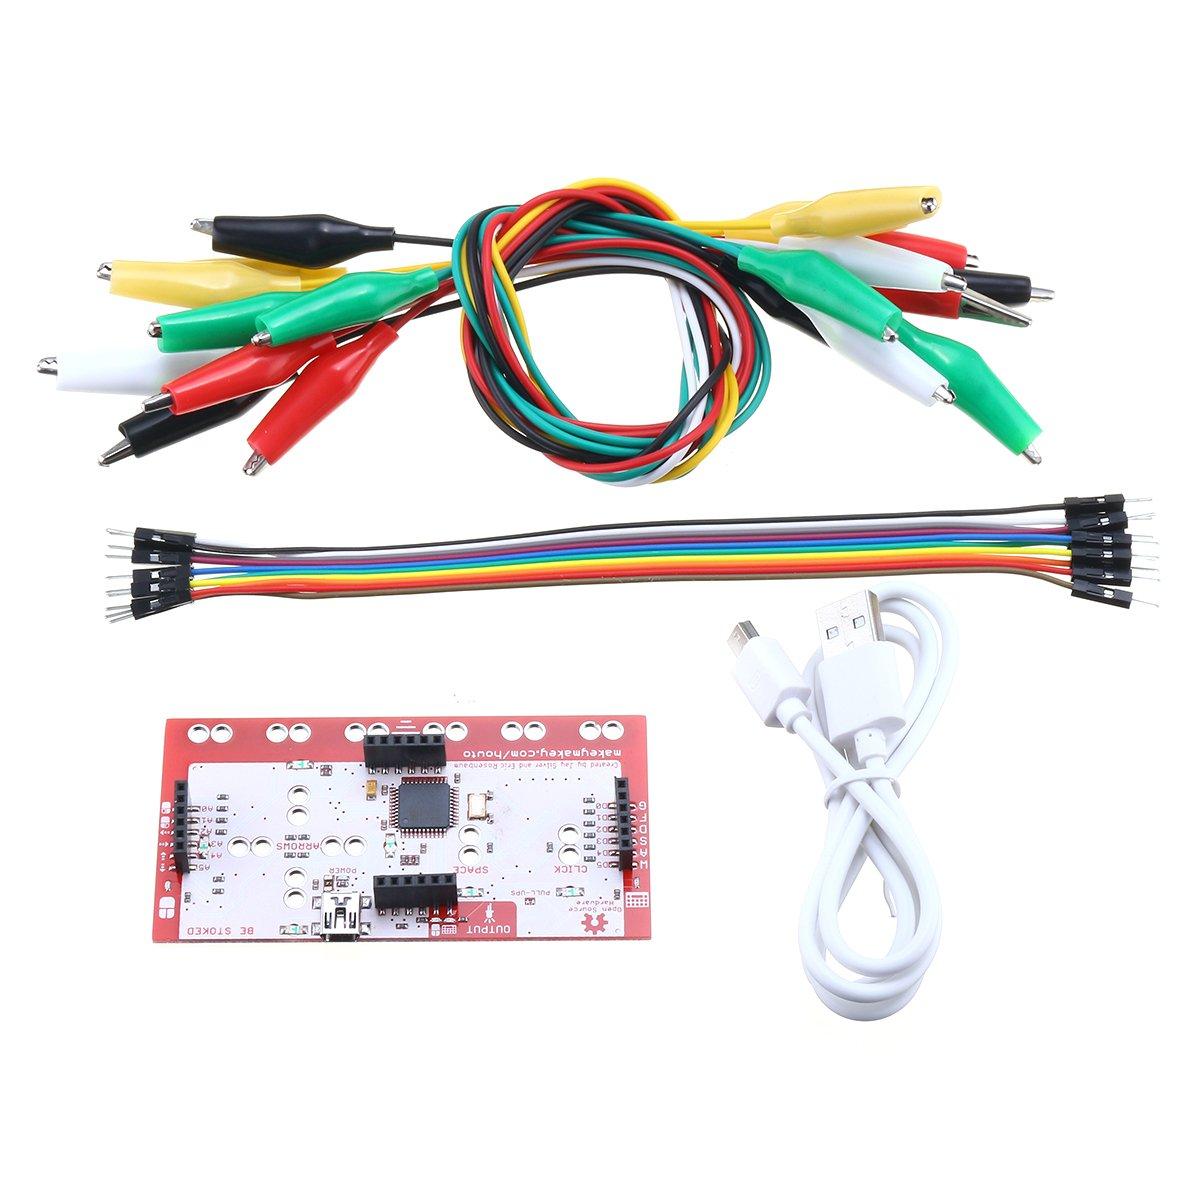 EsportsMJJ Alligator Clip Jumper Wire Standard Controller Board Kit for Makey Makey Science Toy